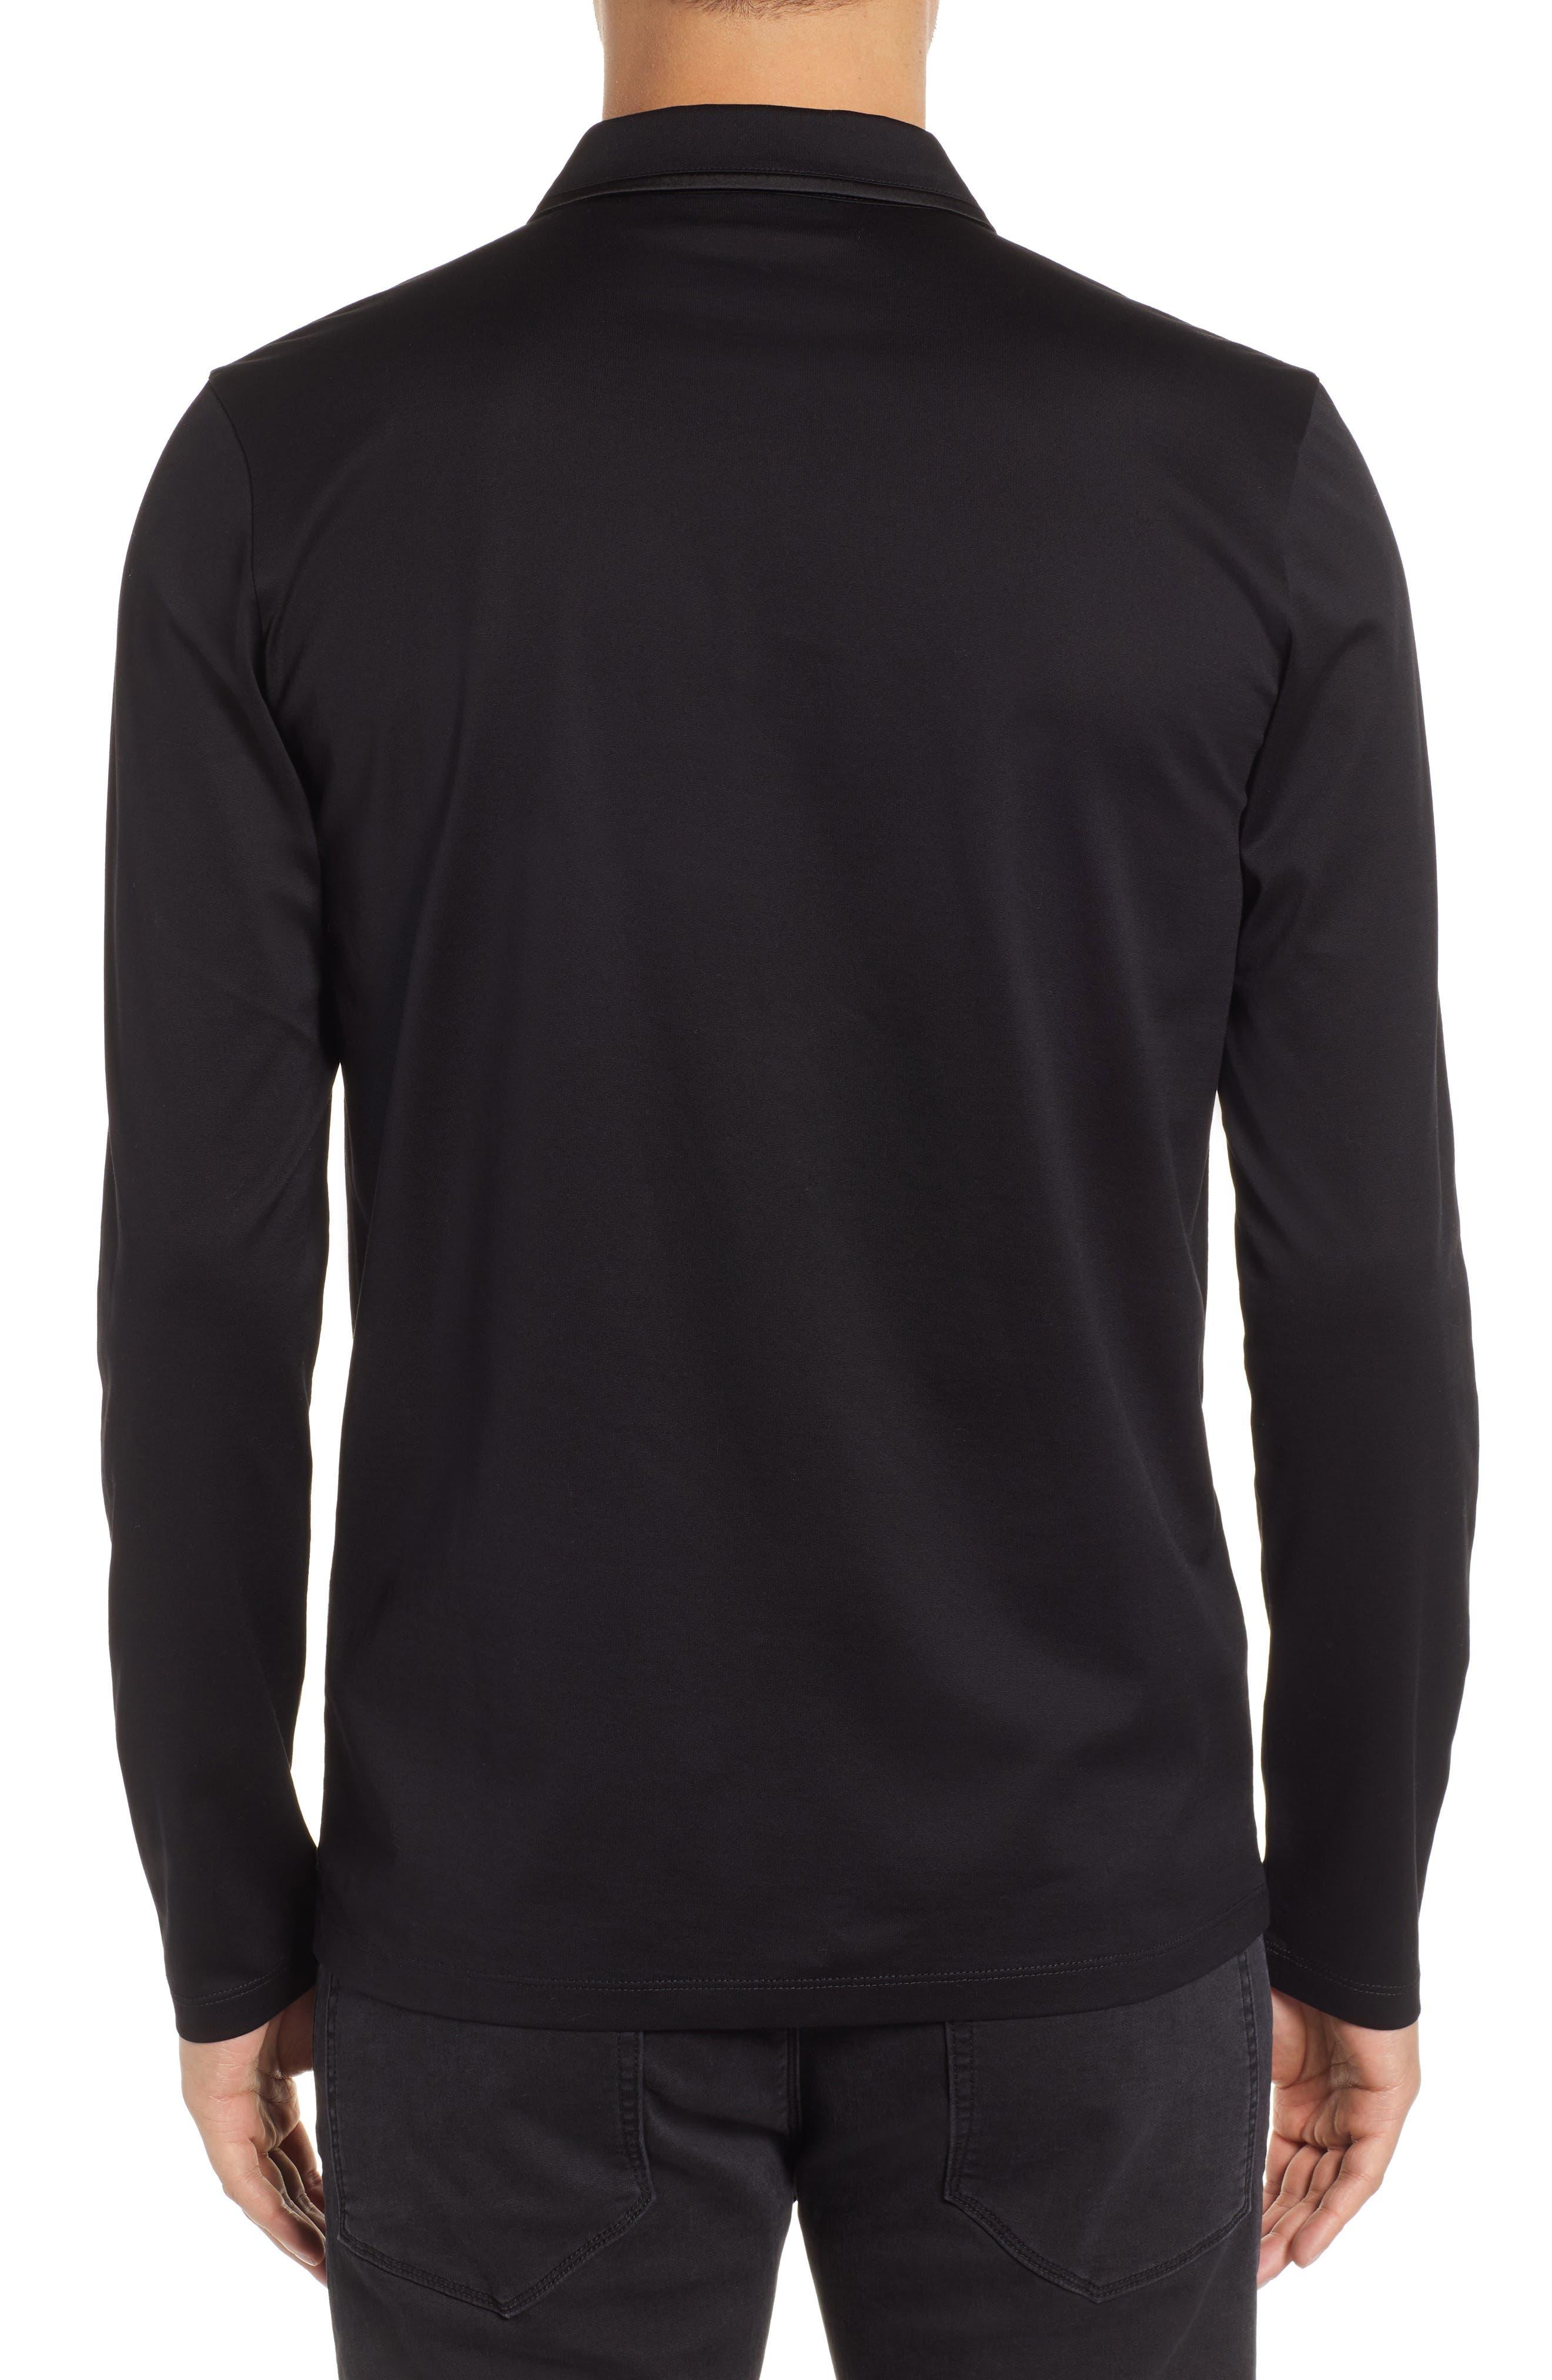 Dalendar Mercerized Cotton Slim Fit Polo Shirt,                             Alternate thumbnail 2, color,                             BLACK